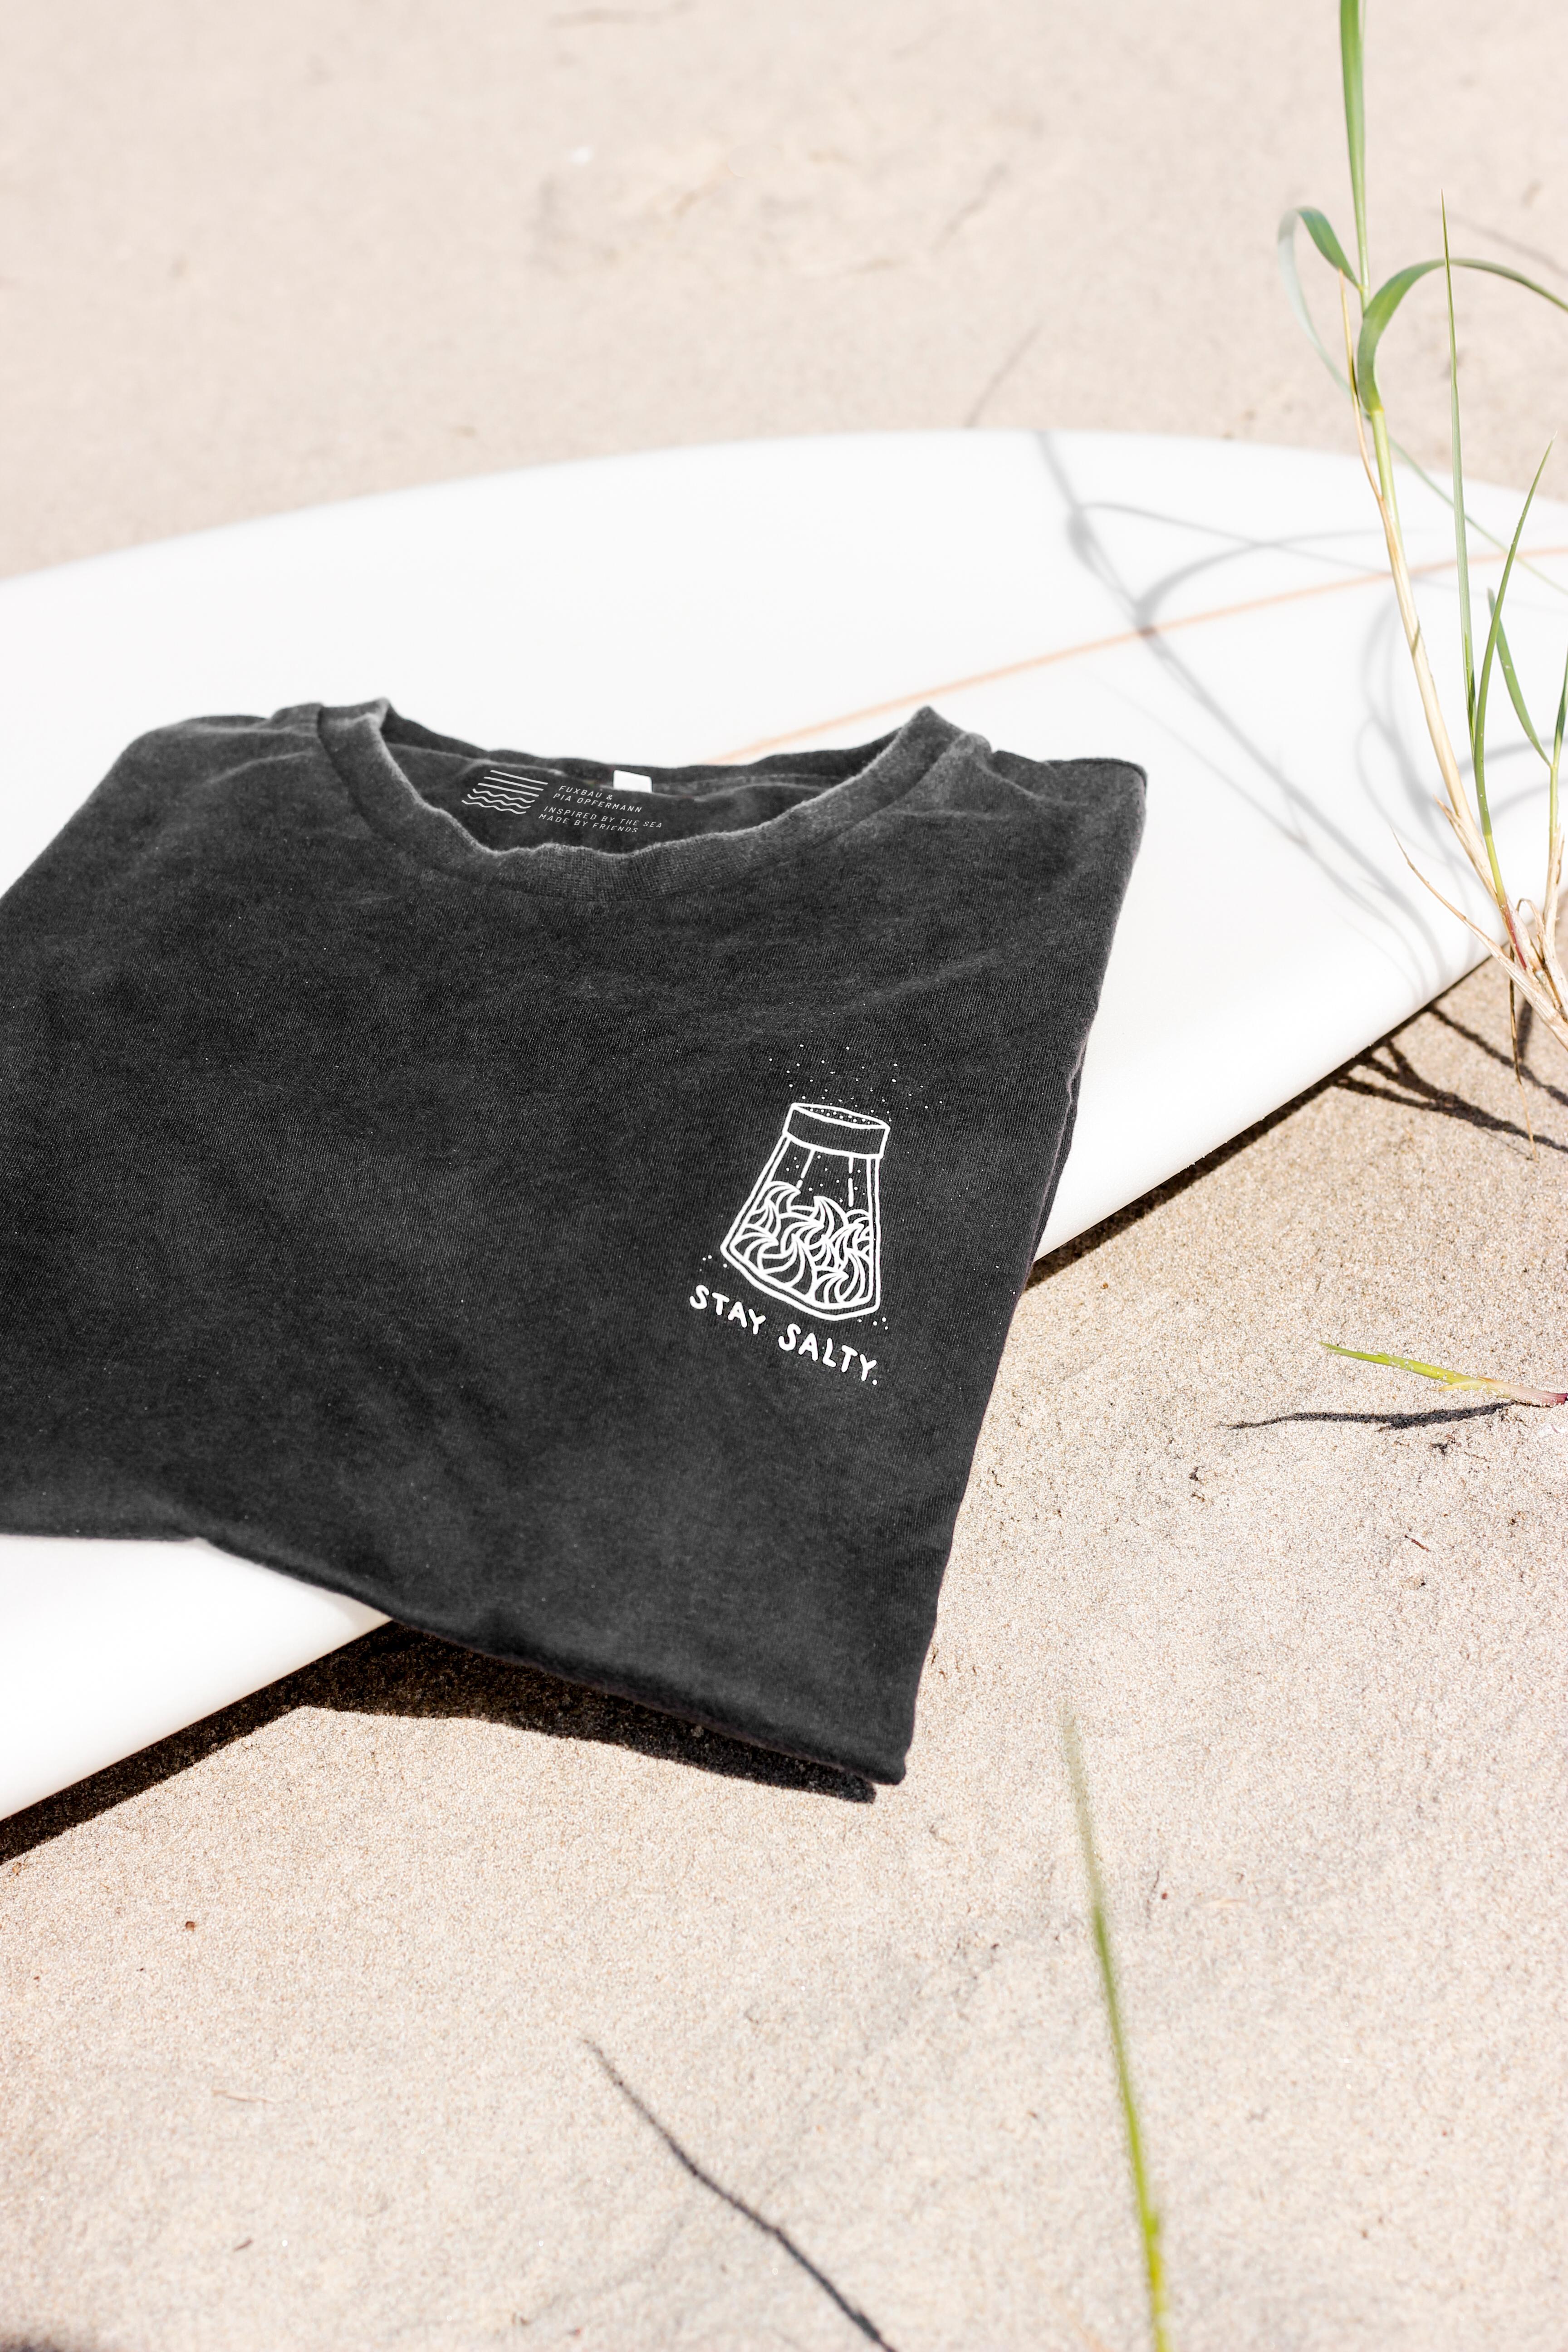 01_Shirts